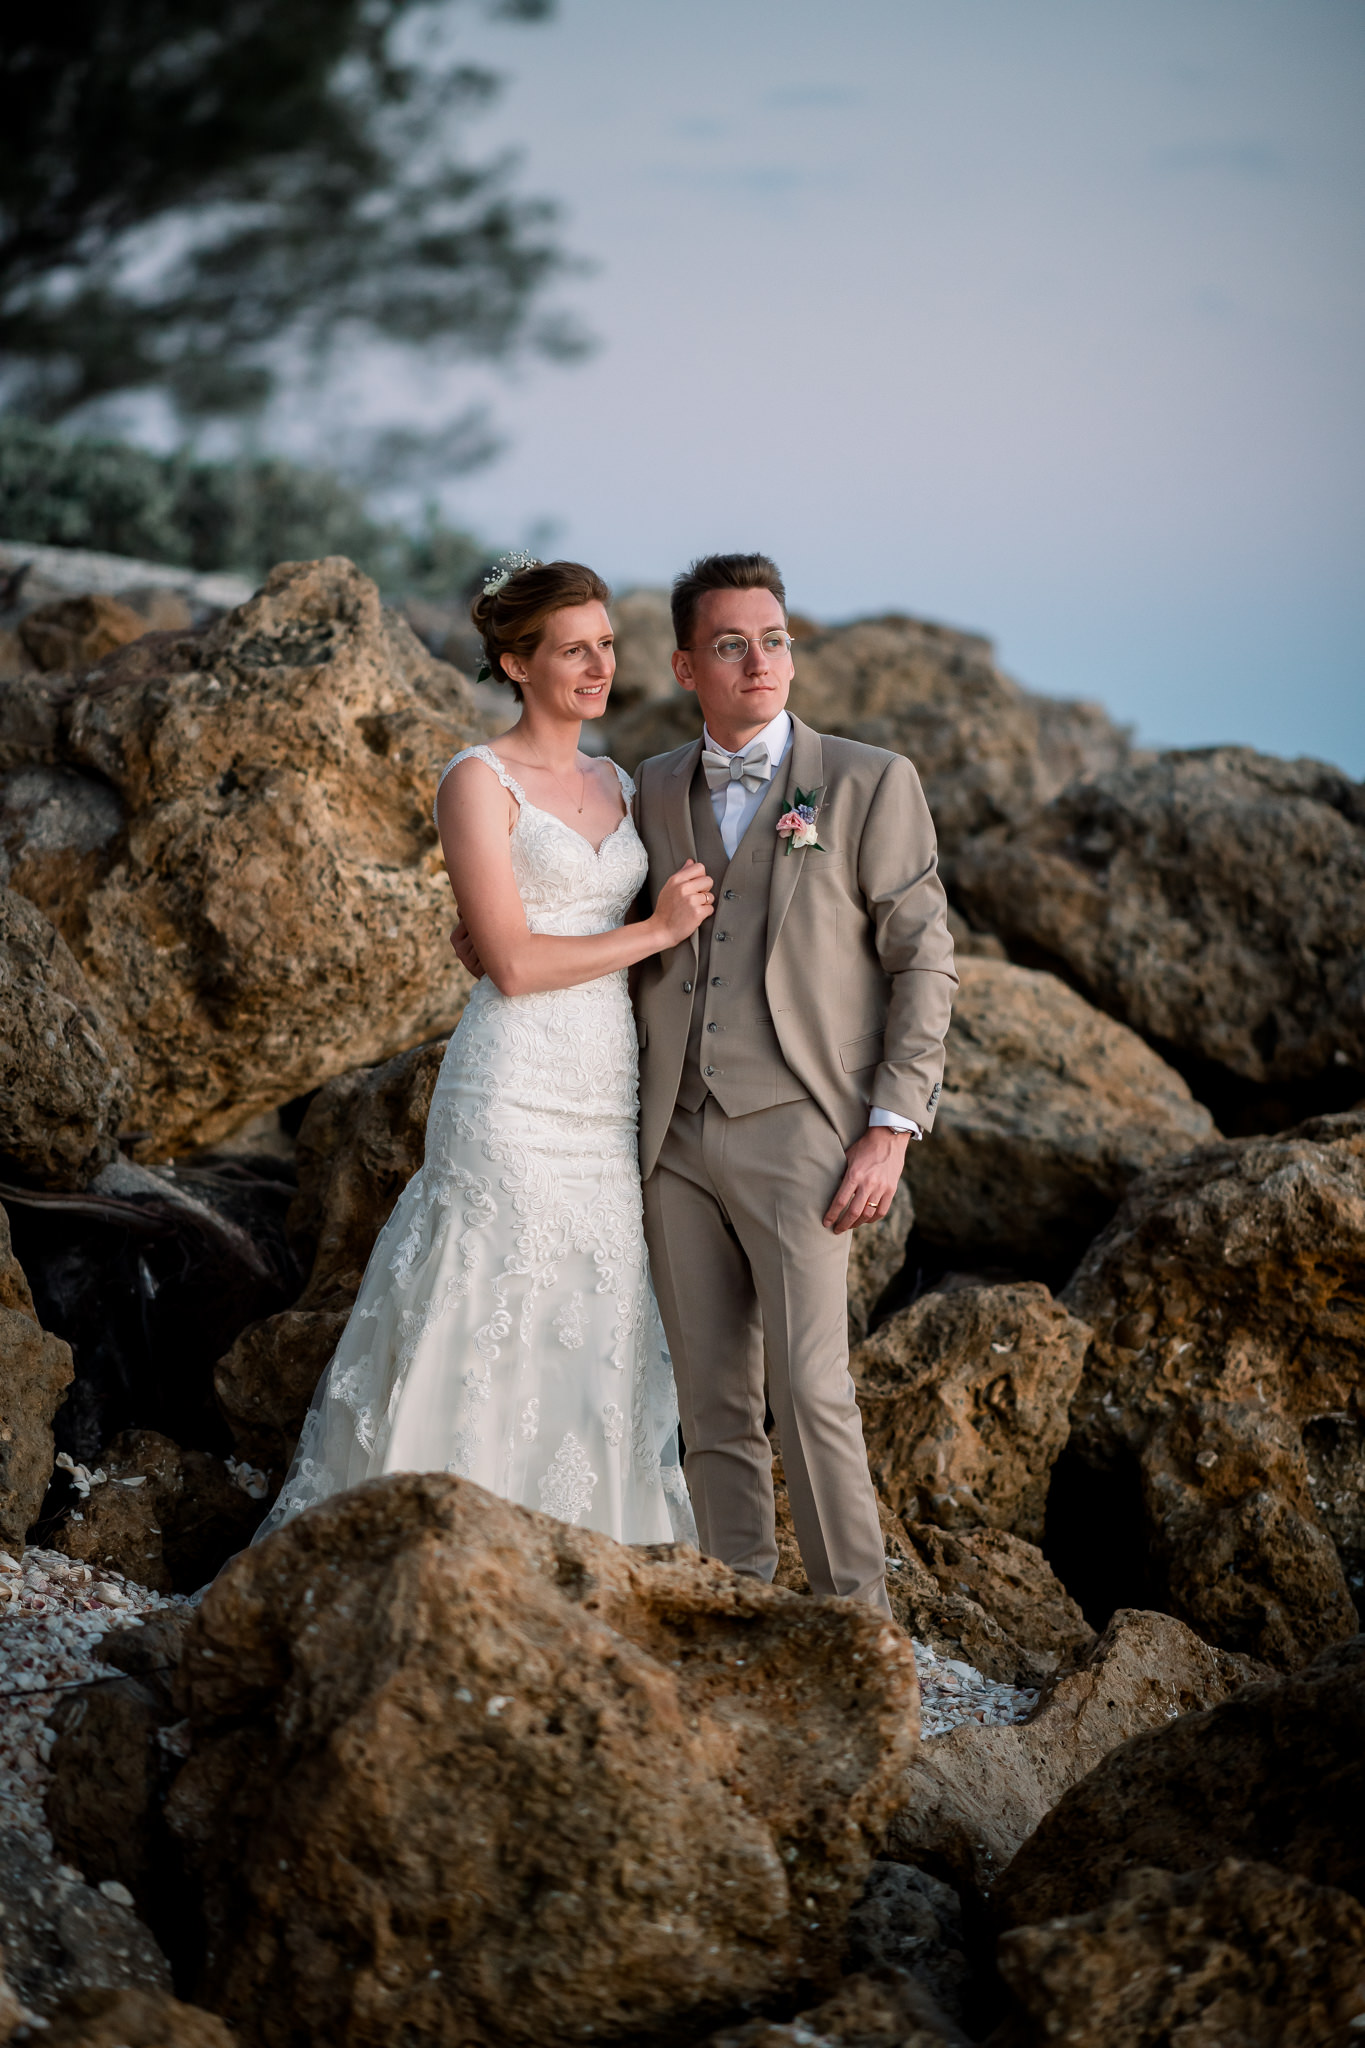 SARASOTA_WEDDING_PHOTOGRAPHY_SMMZ_1473.jpg